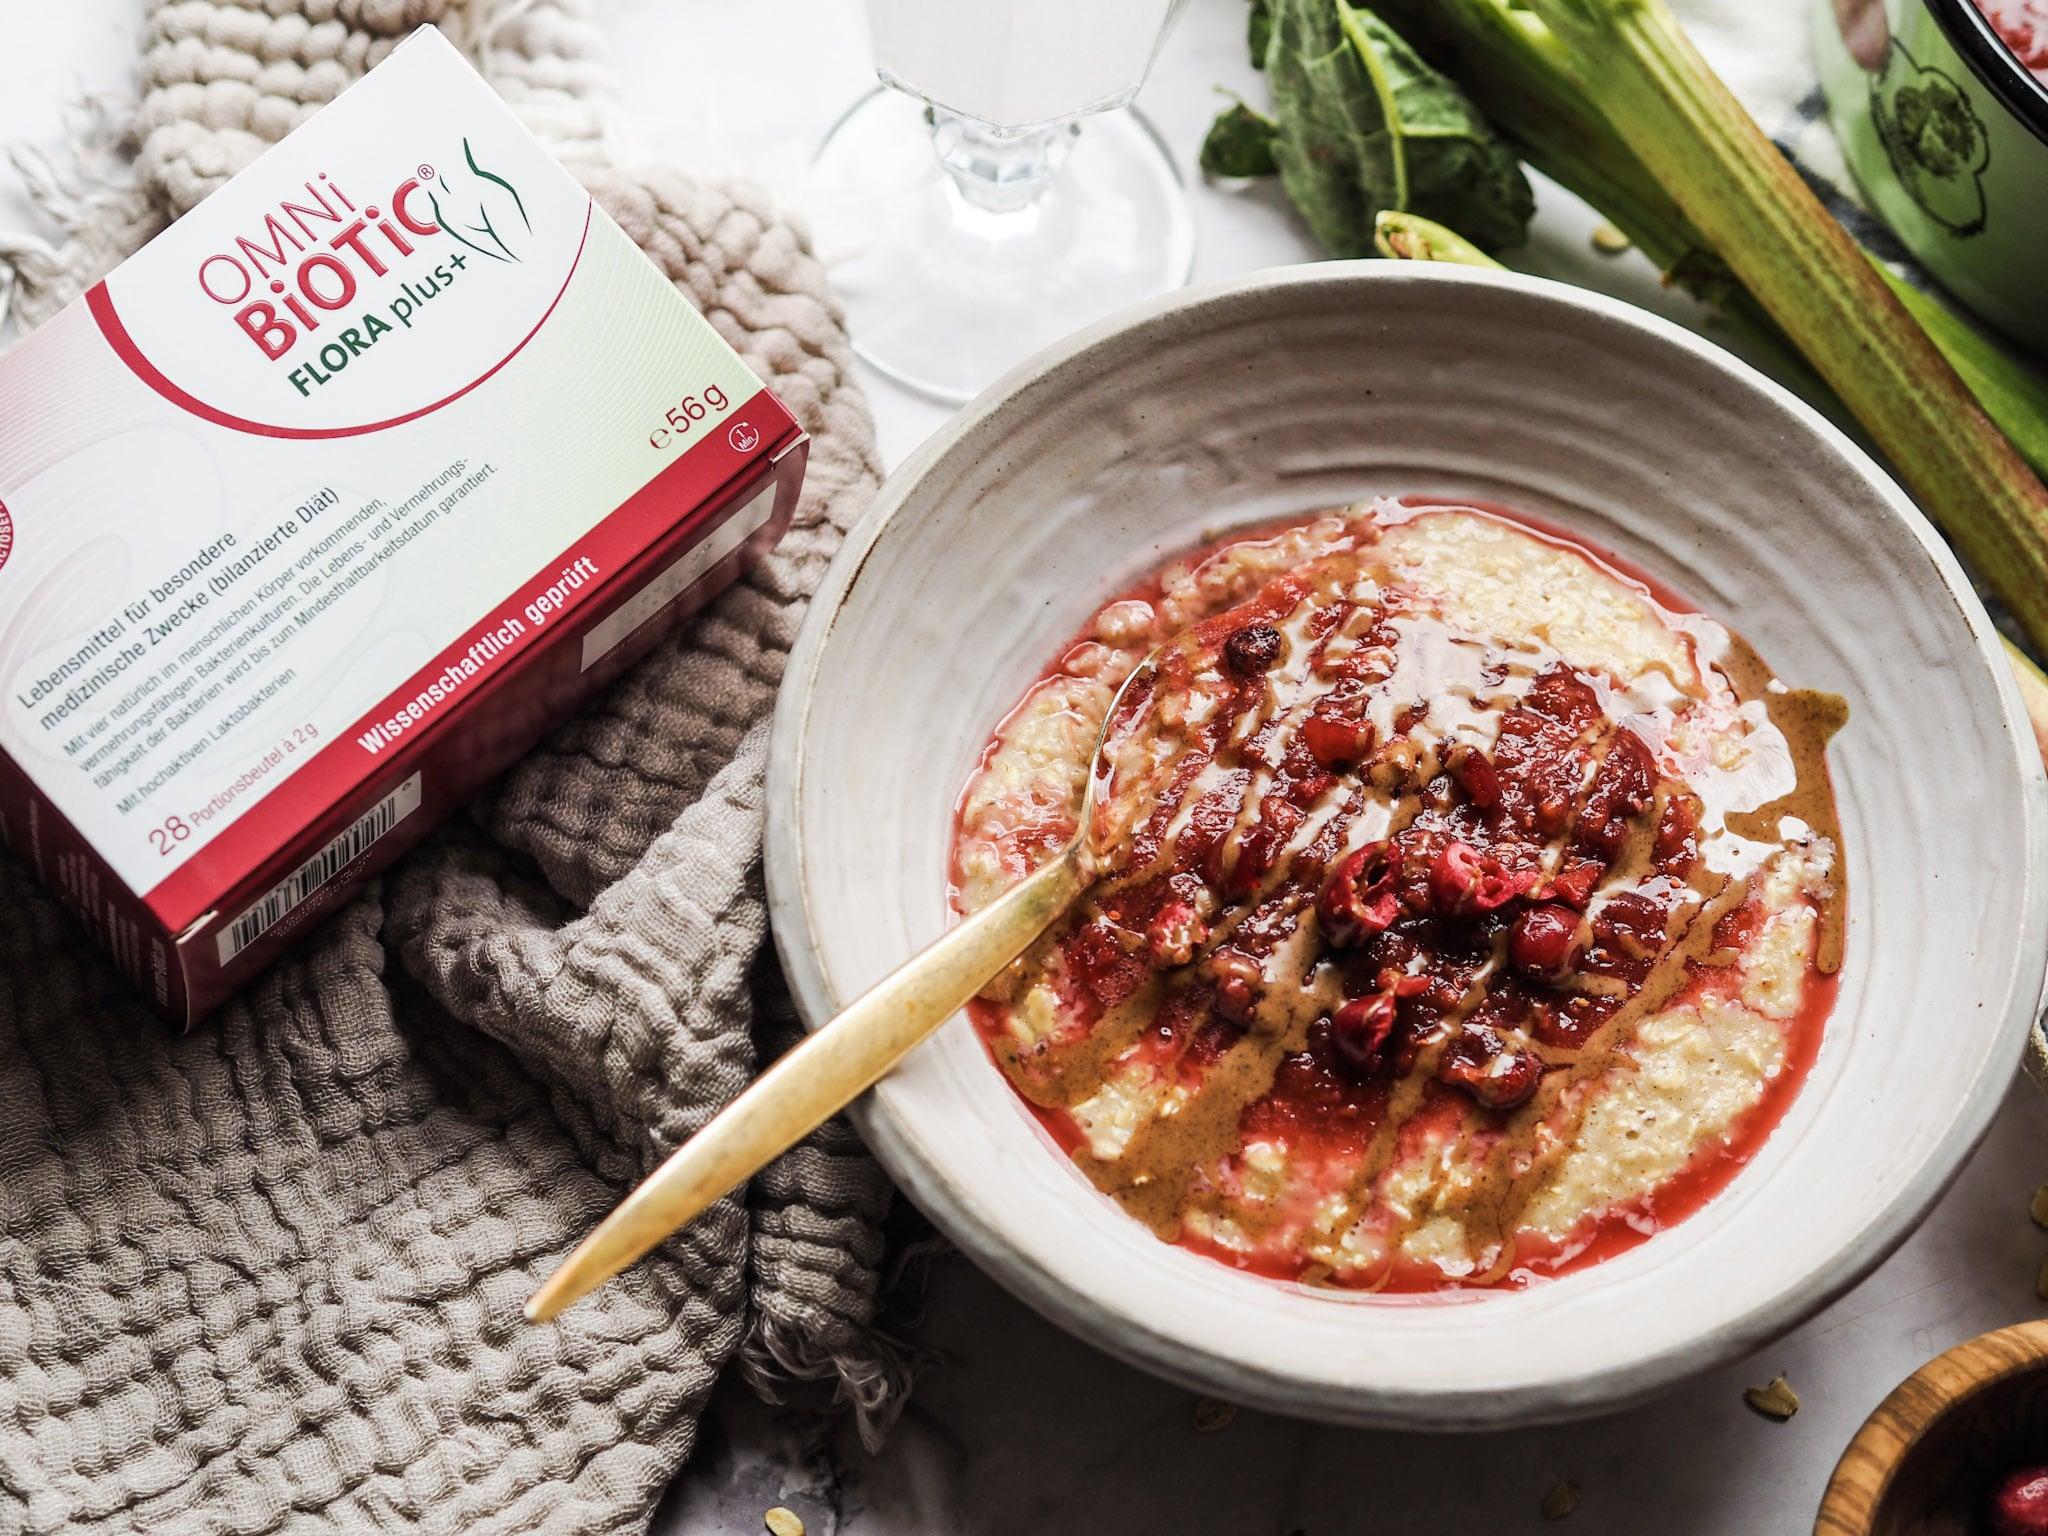 OMNi-BiOTiC FLORA plus+ Getränk mit Haselnuss-Porridge mit Cranberry-Rhabarber-Kompott